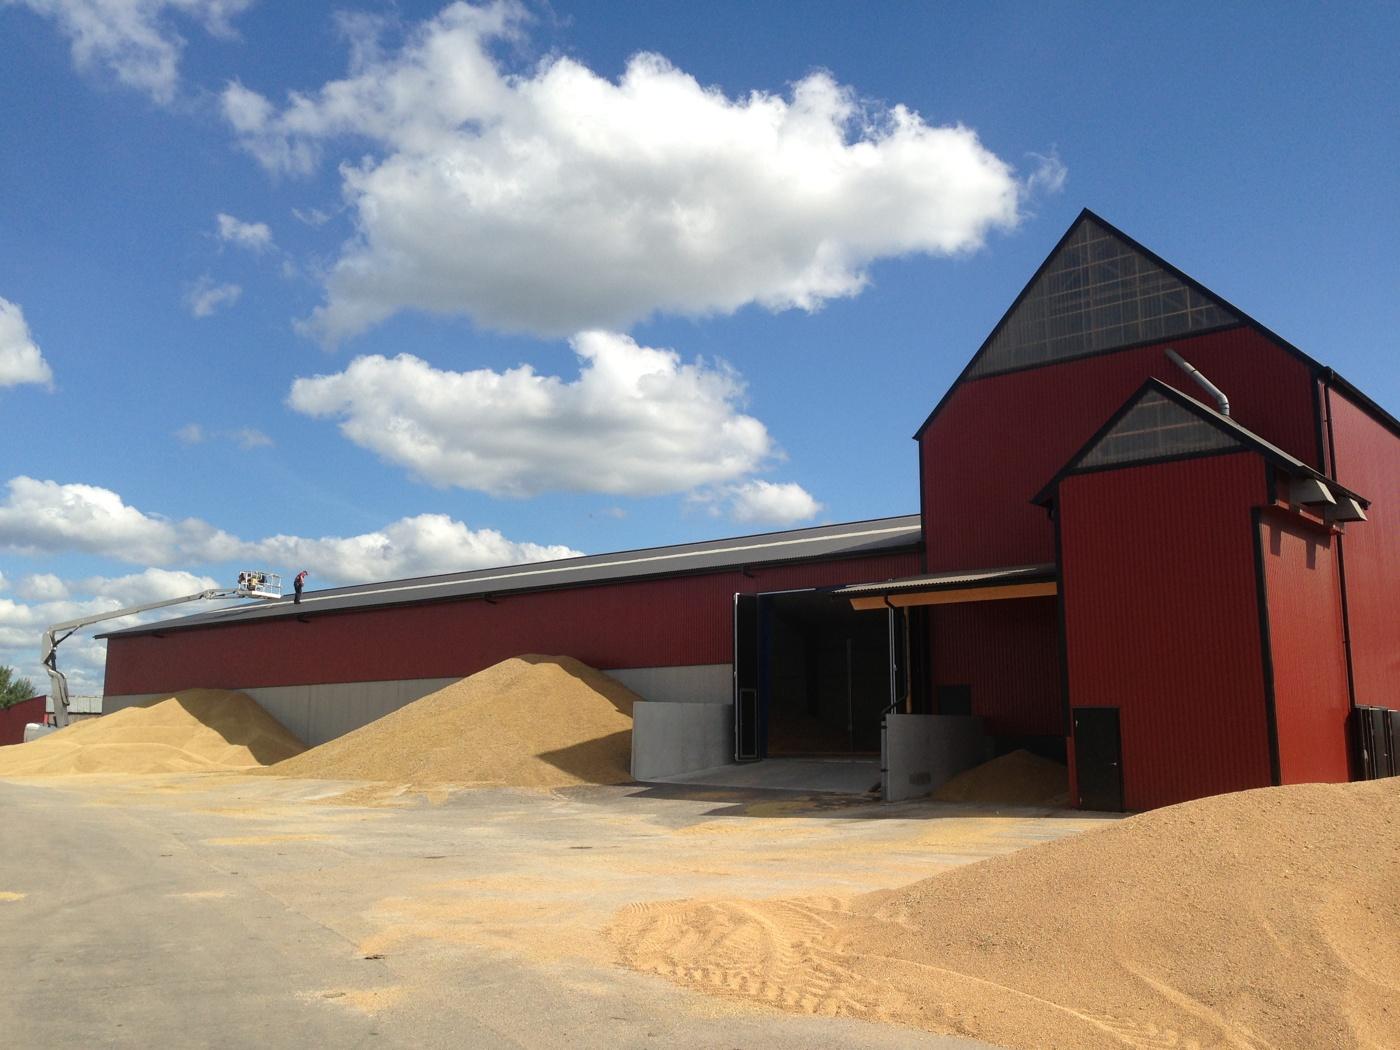 Vi bygger lagerhallar & stålhallar, kb bygg ab halmstad, halland